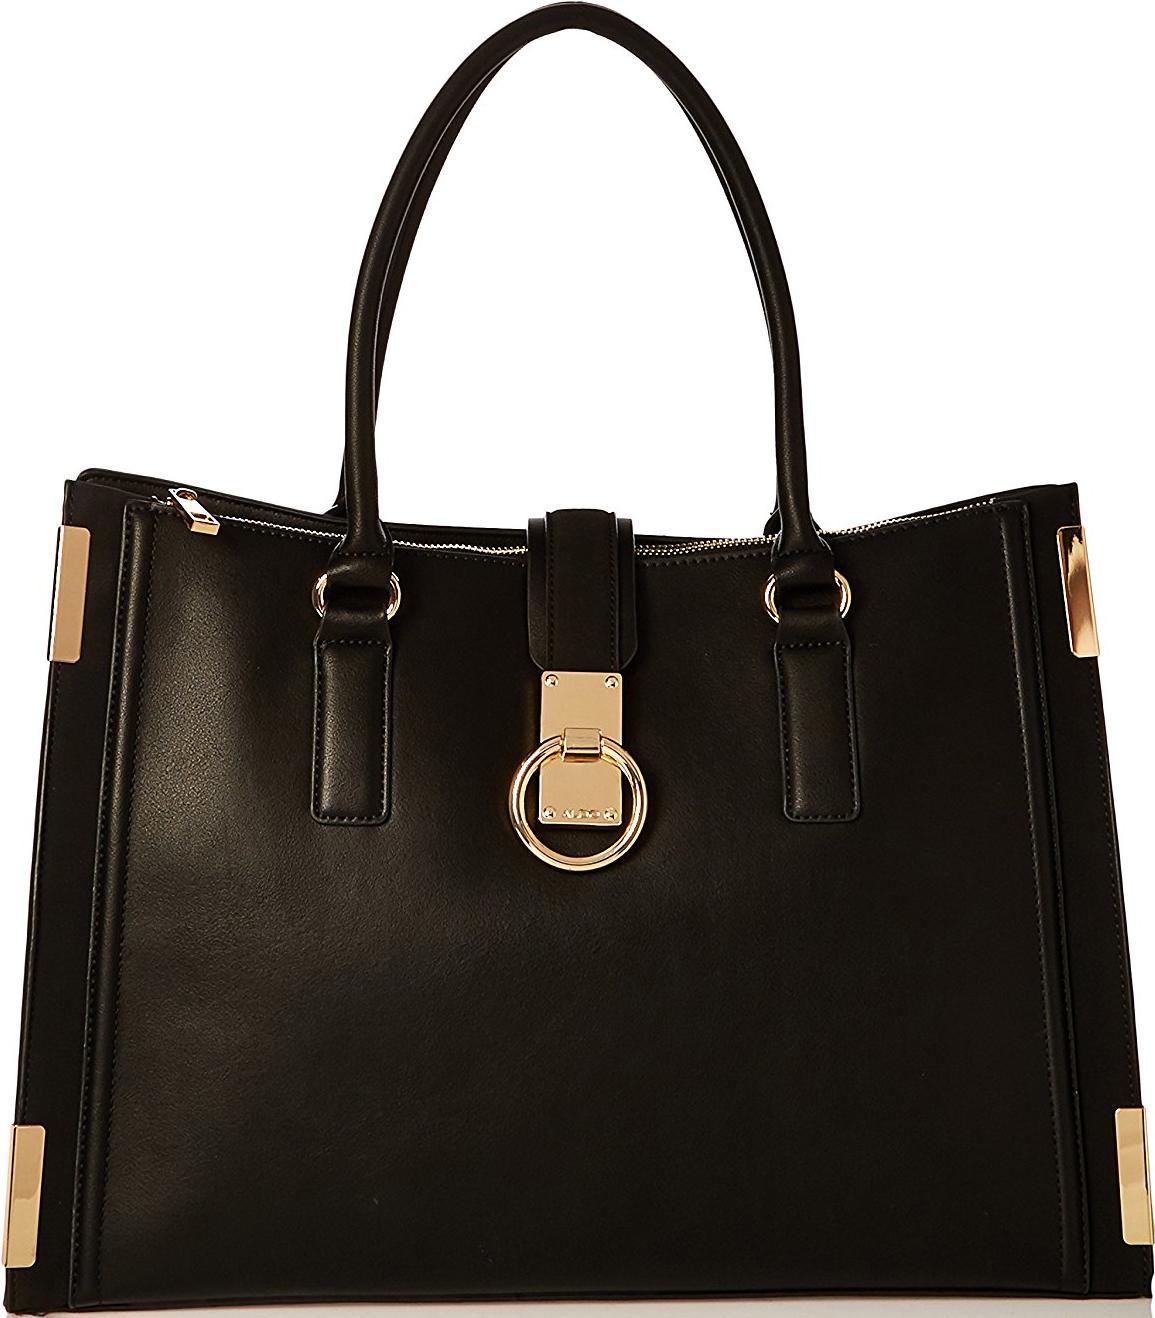 83f993c78fe Aldo Black 'Rosebud' Shoulder Handbag   Bags   Shoulder handbags ...